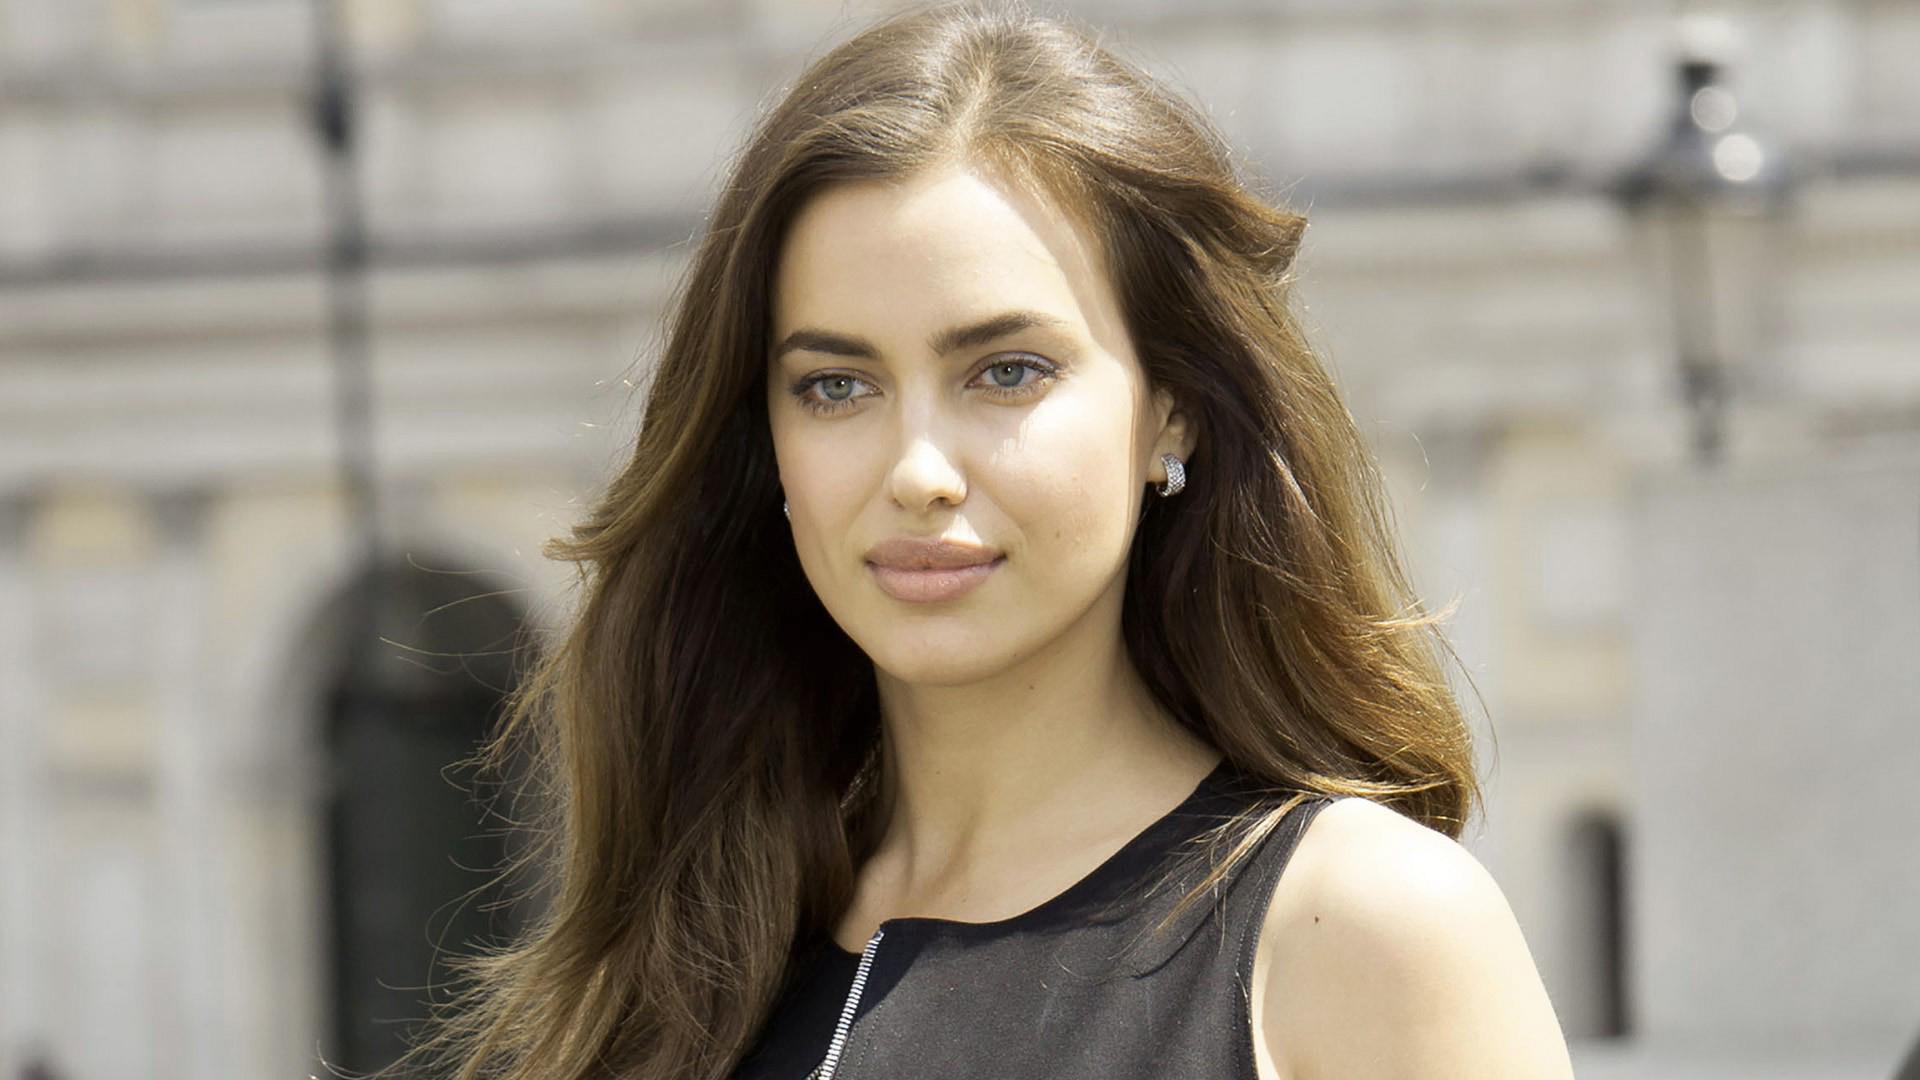 most beautiful women in the world - HD1920×1080